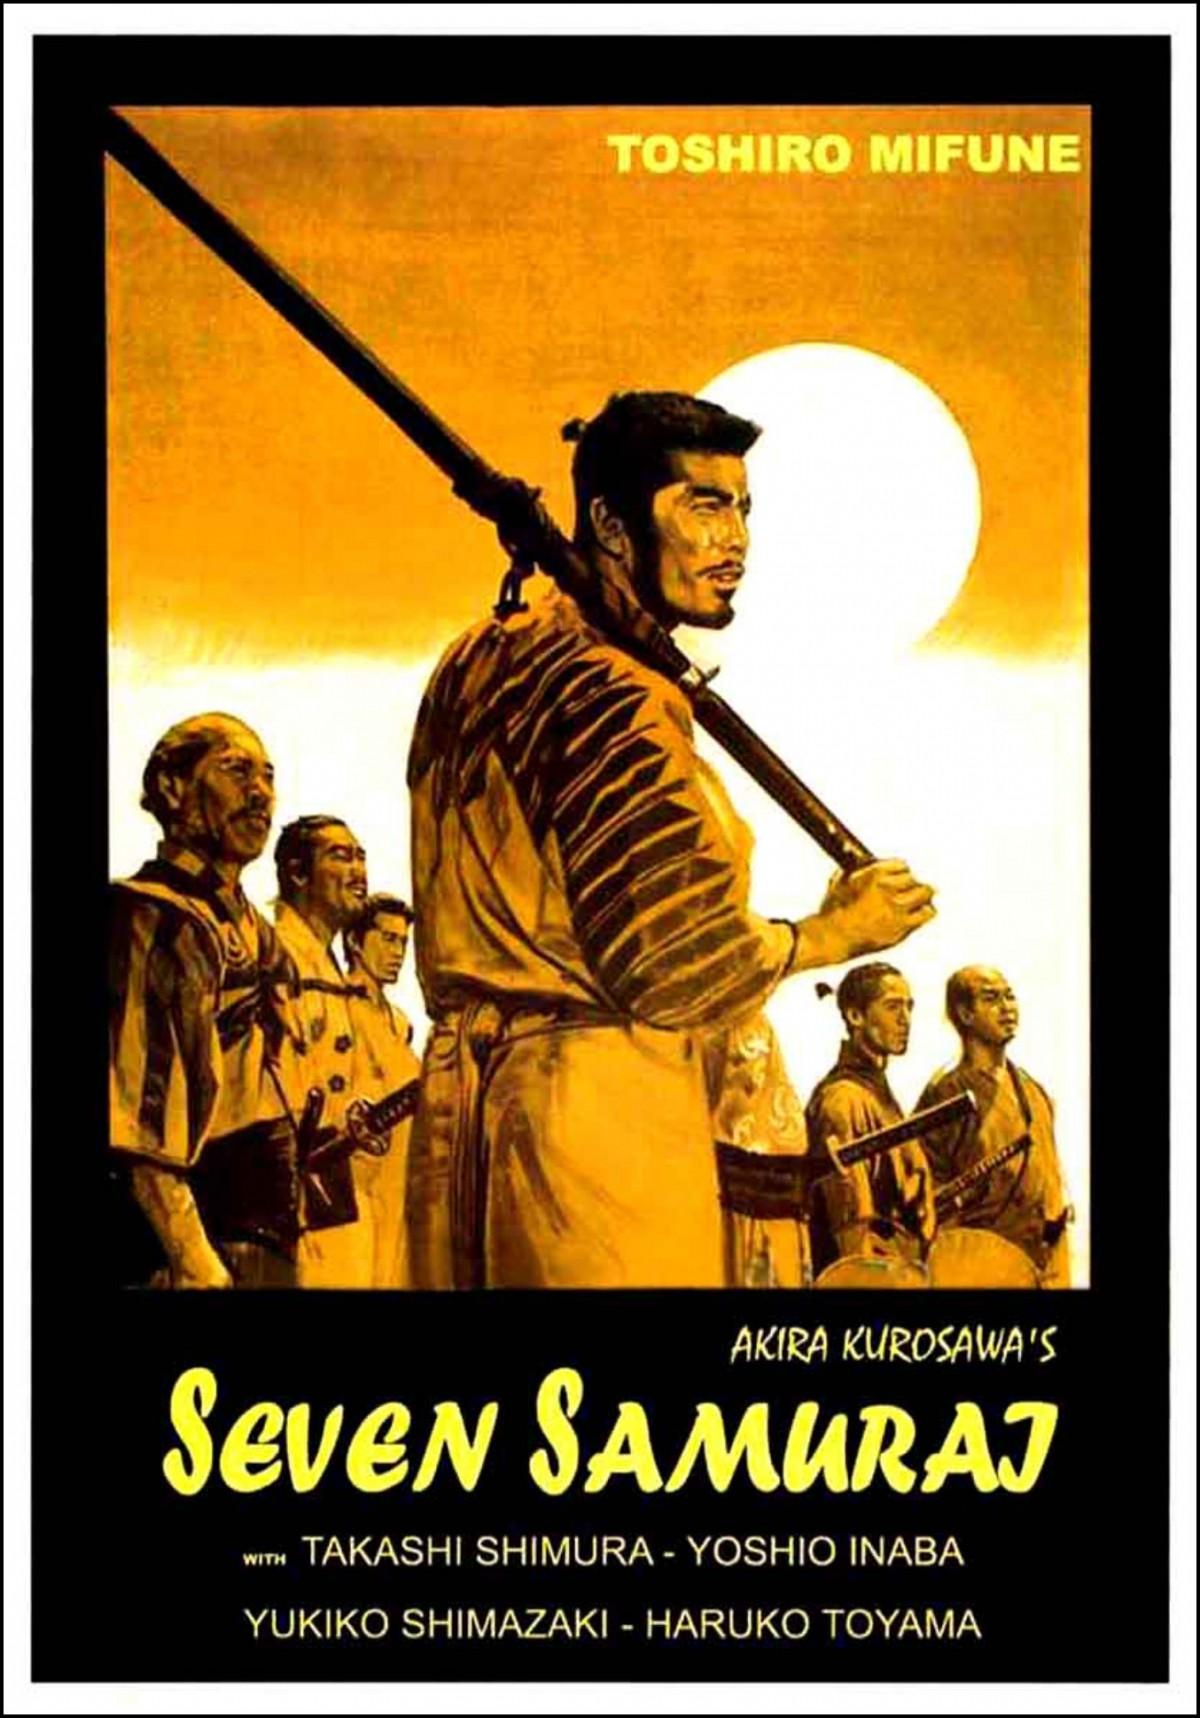 72. Seven Samurai (1954)